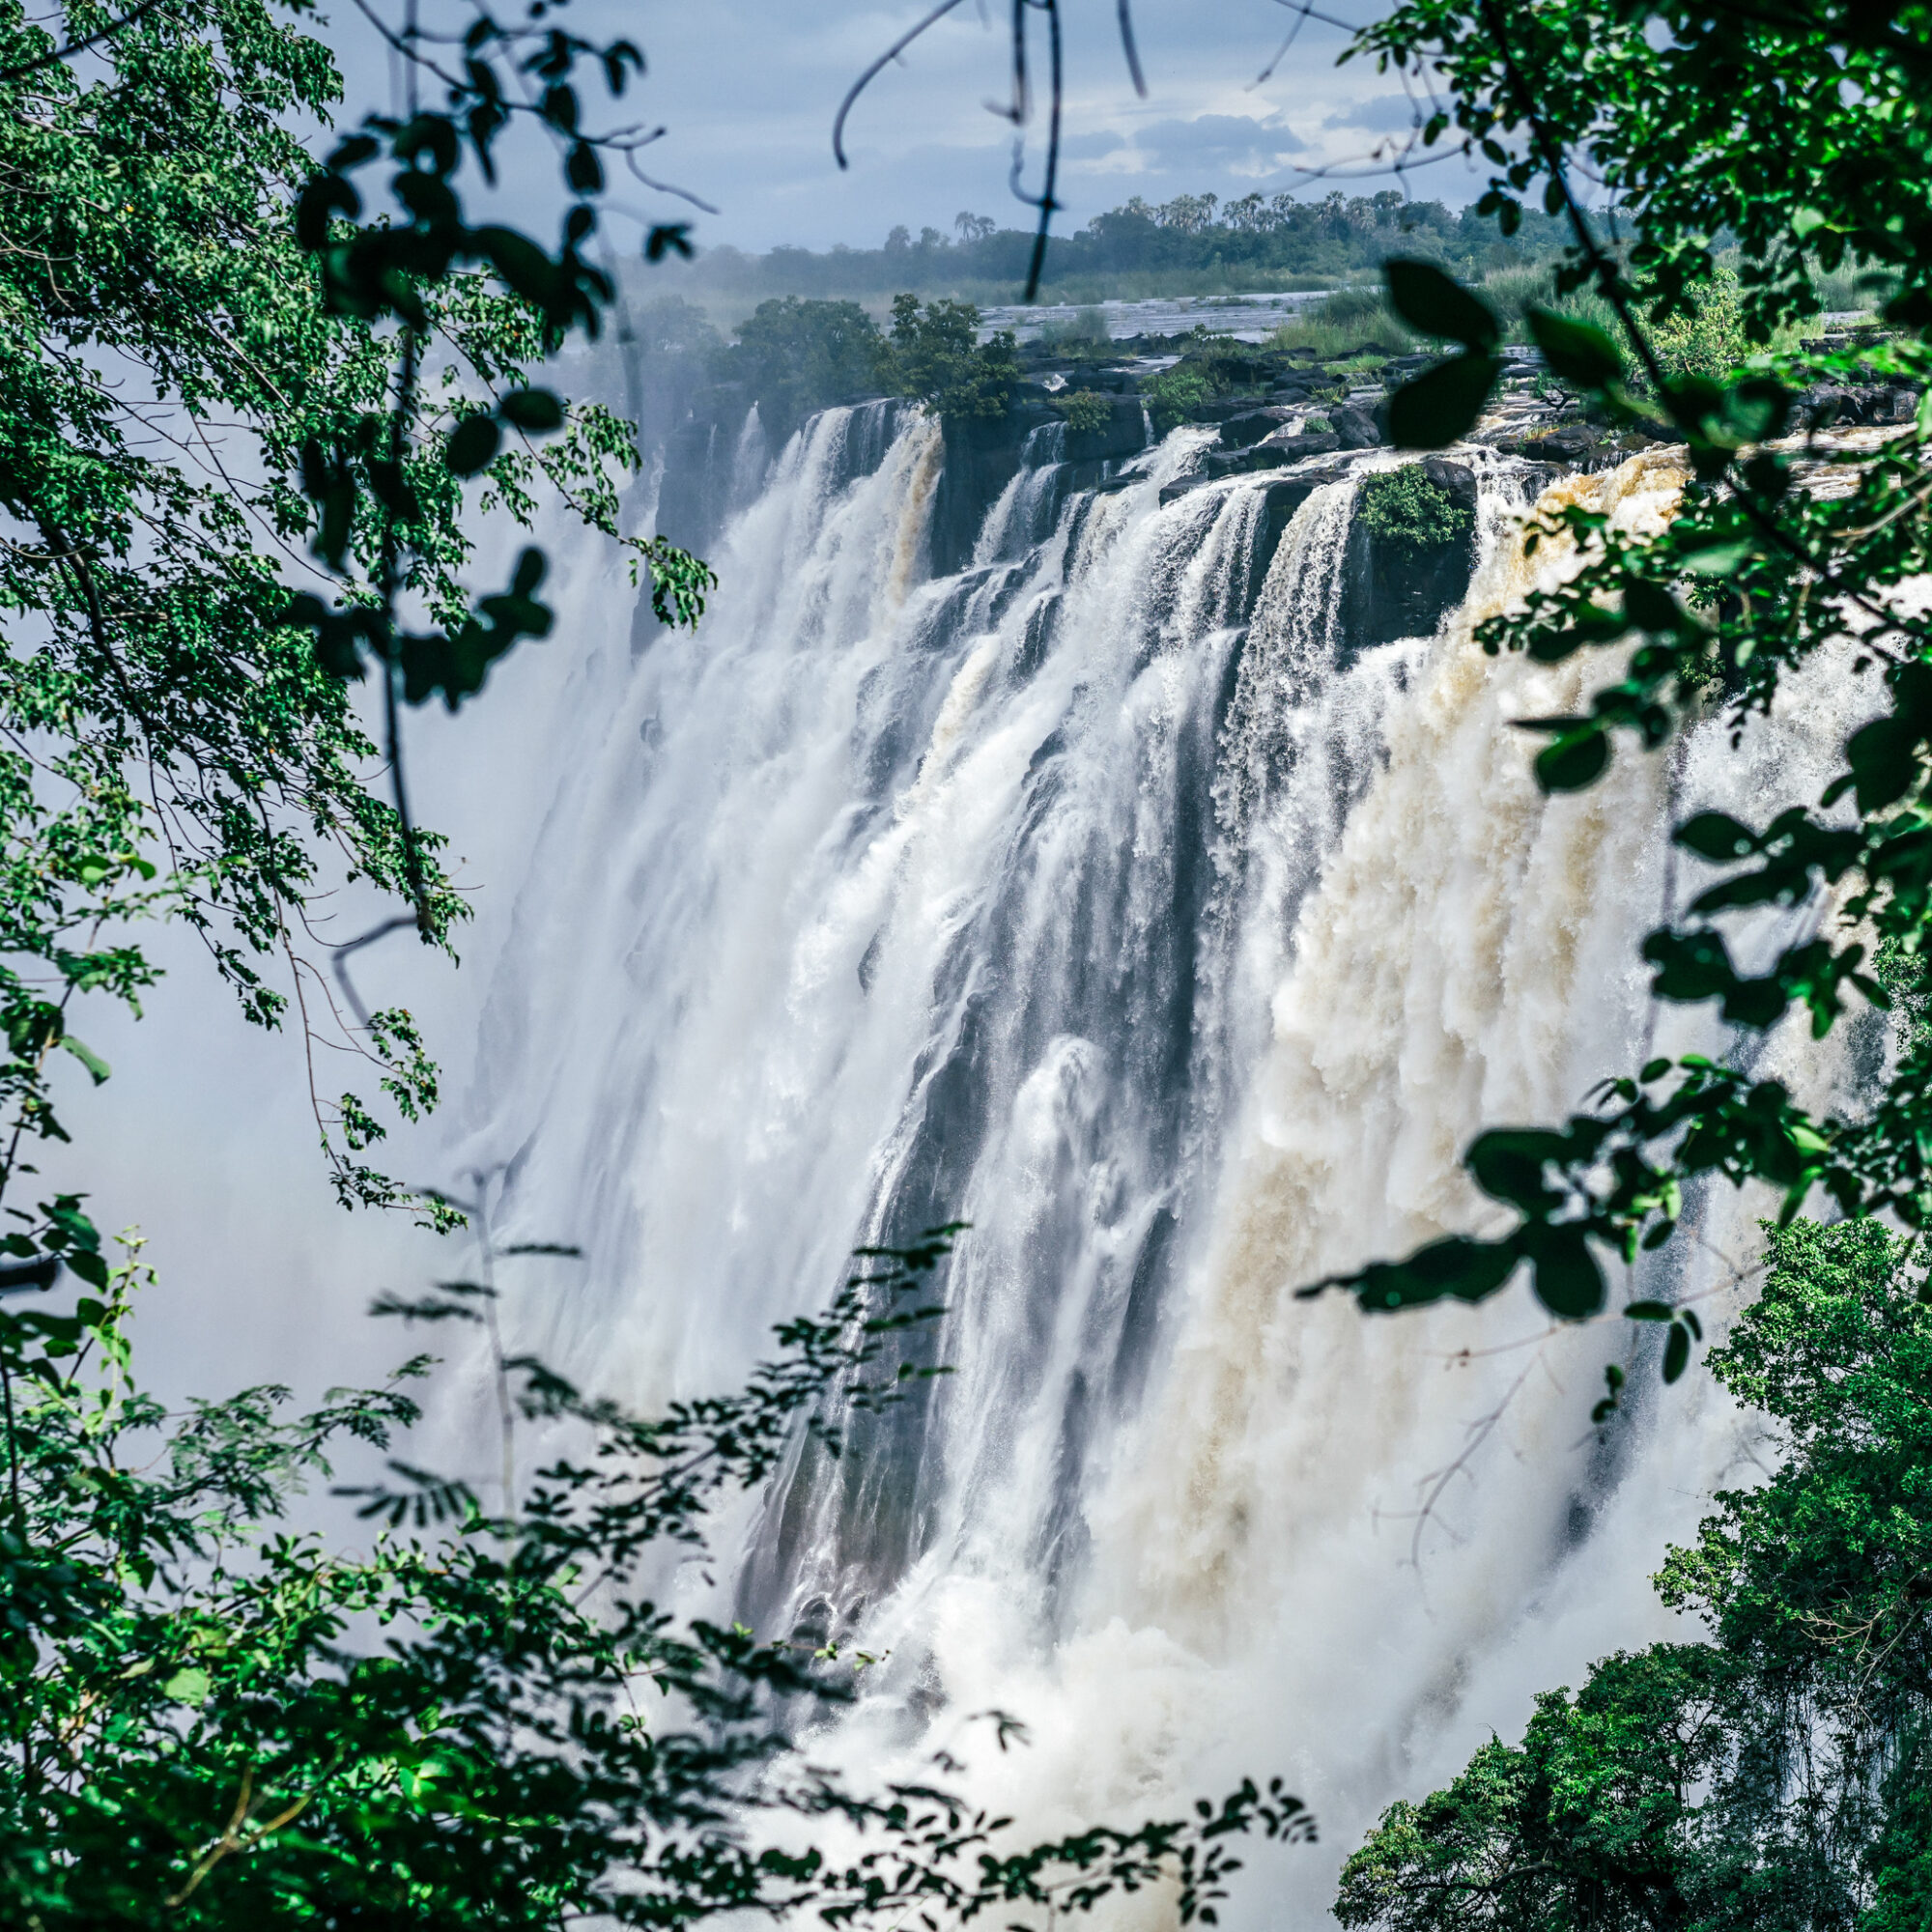 Victoria Falls on the border between Zambia and Zimbabwe.